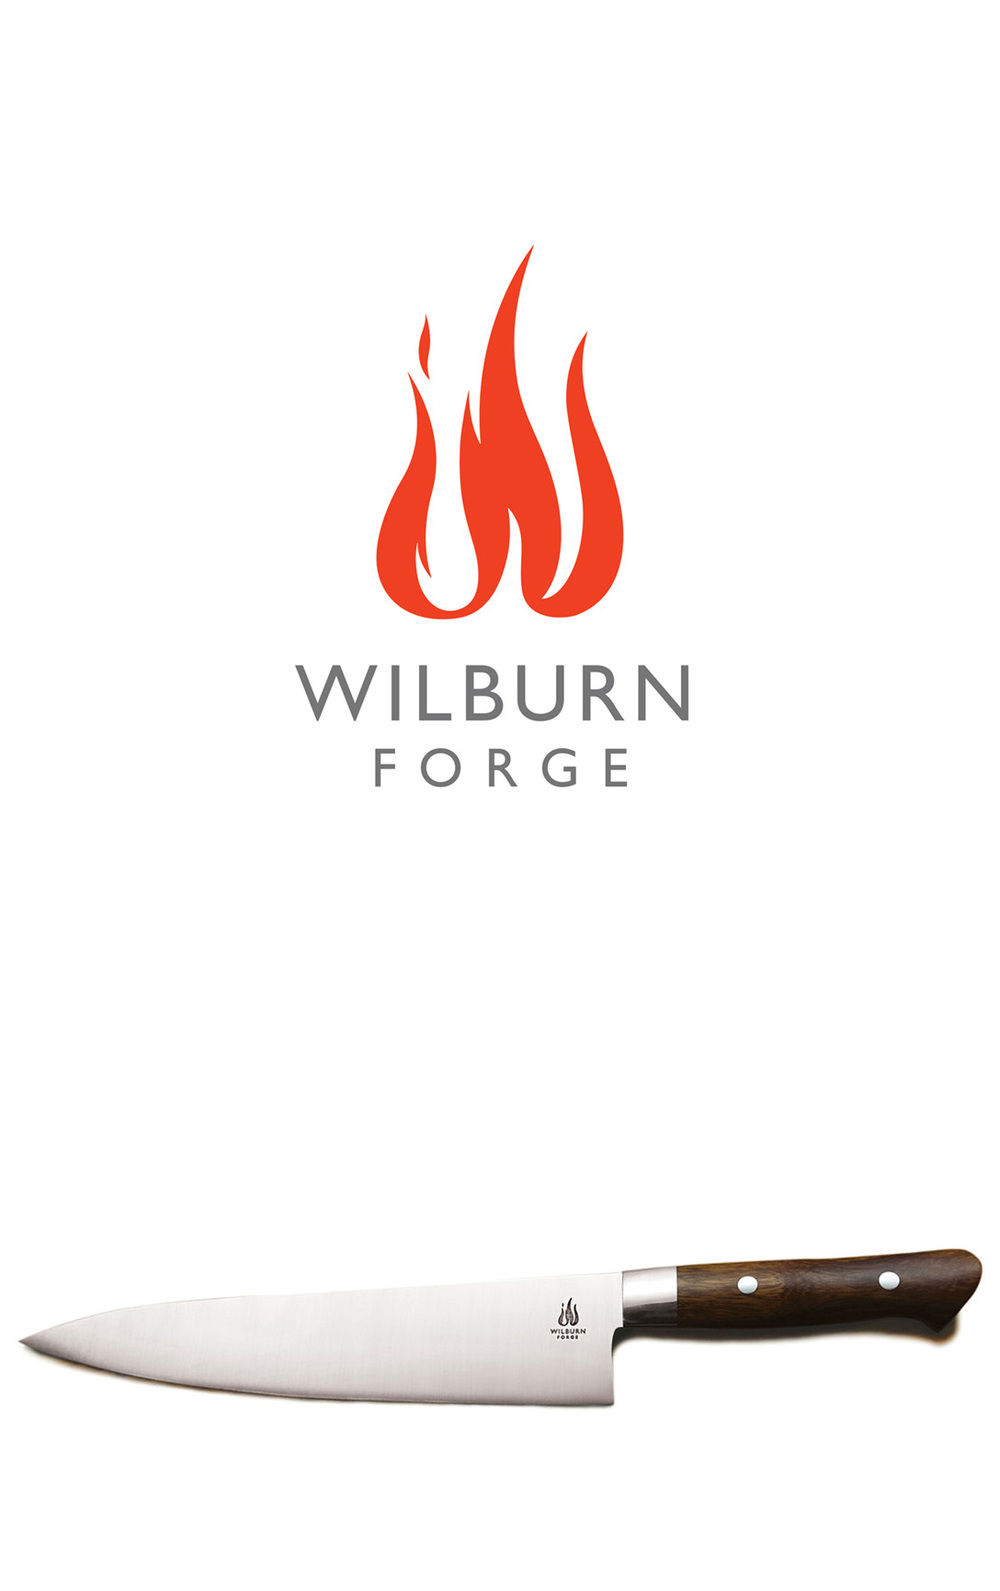 Wilburn Forge identity